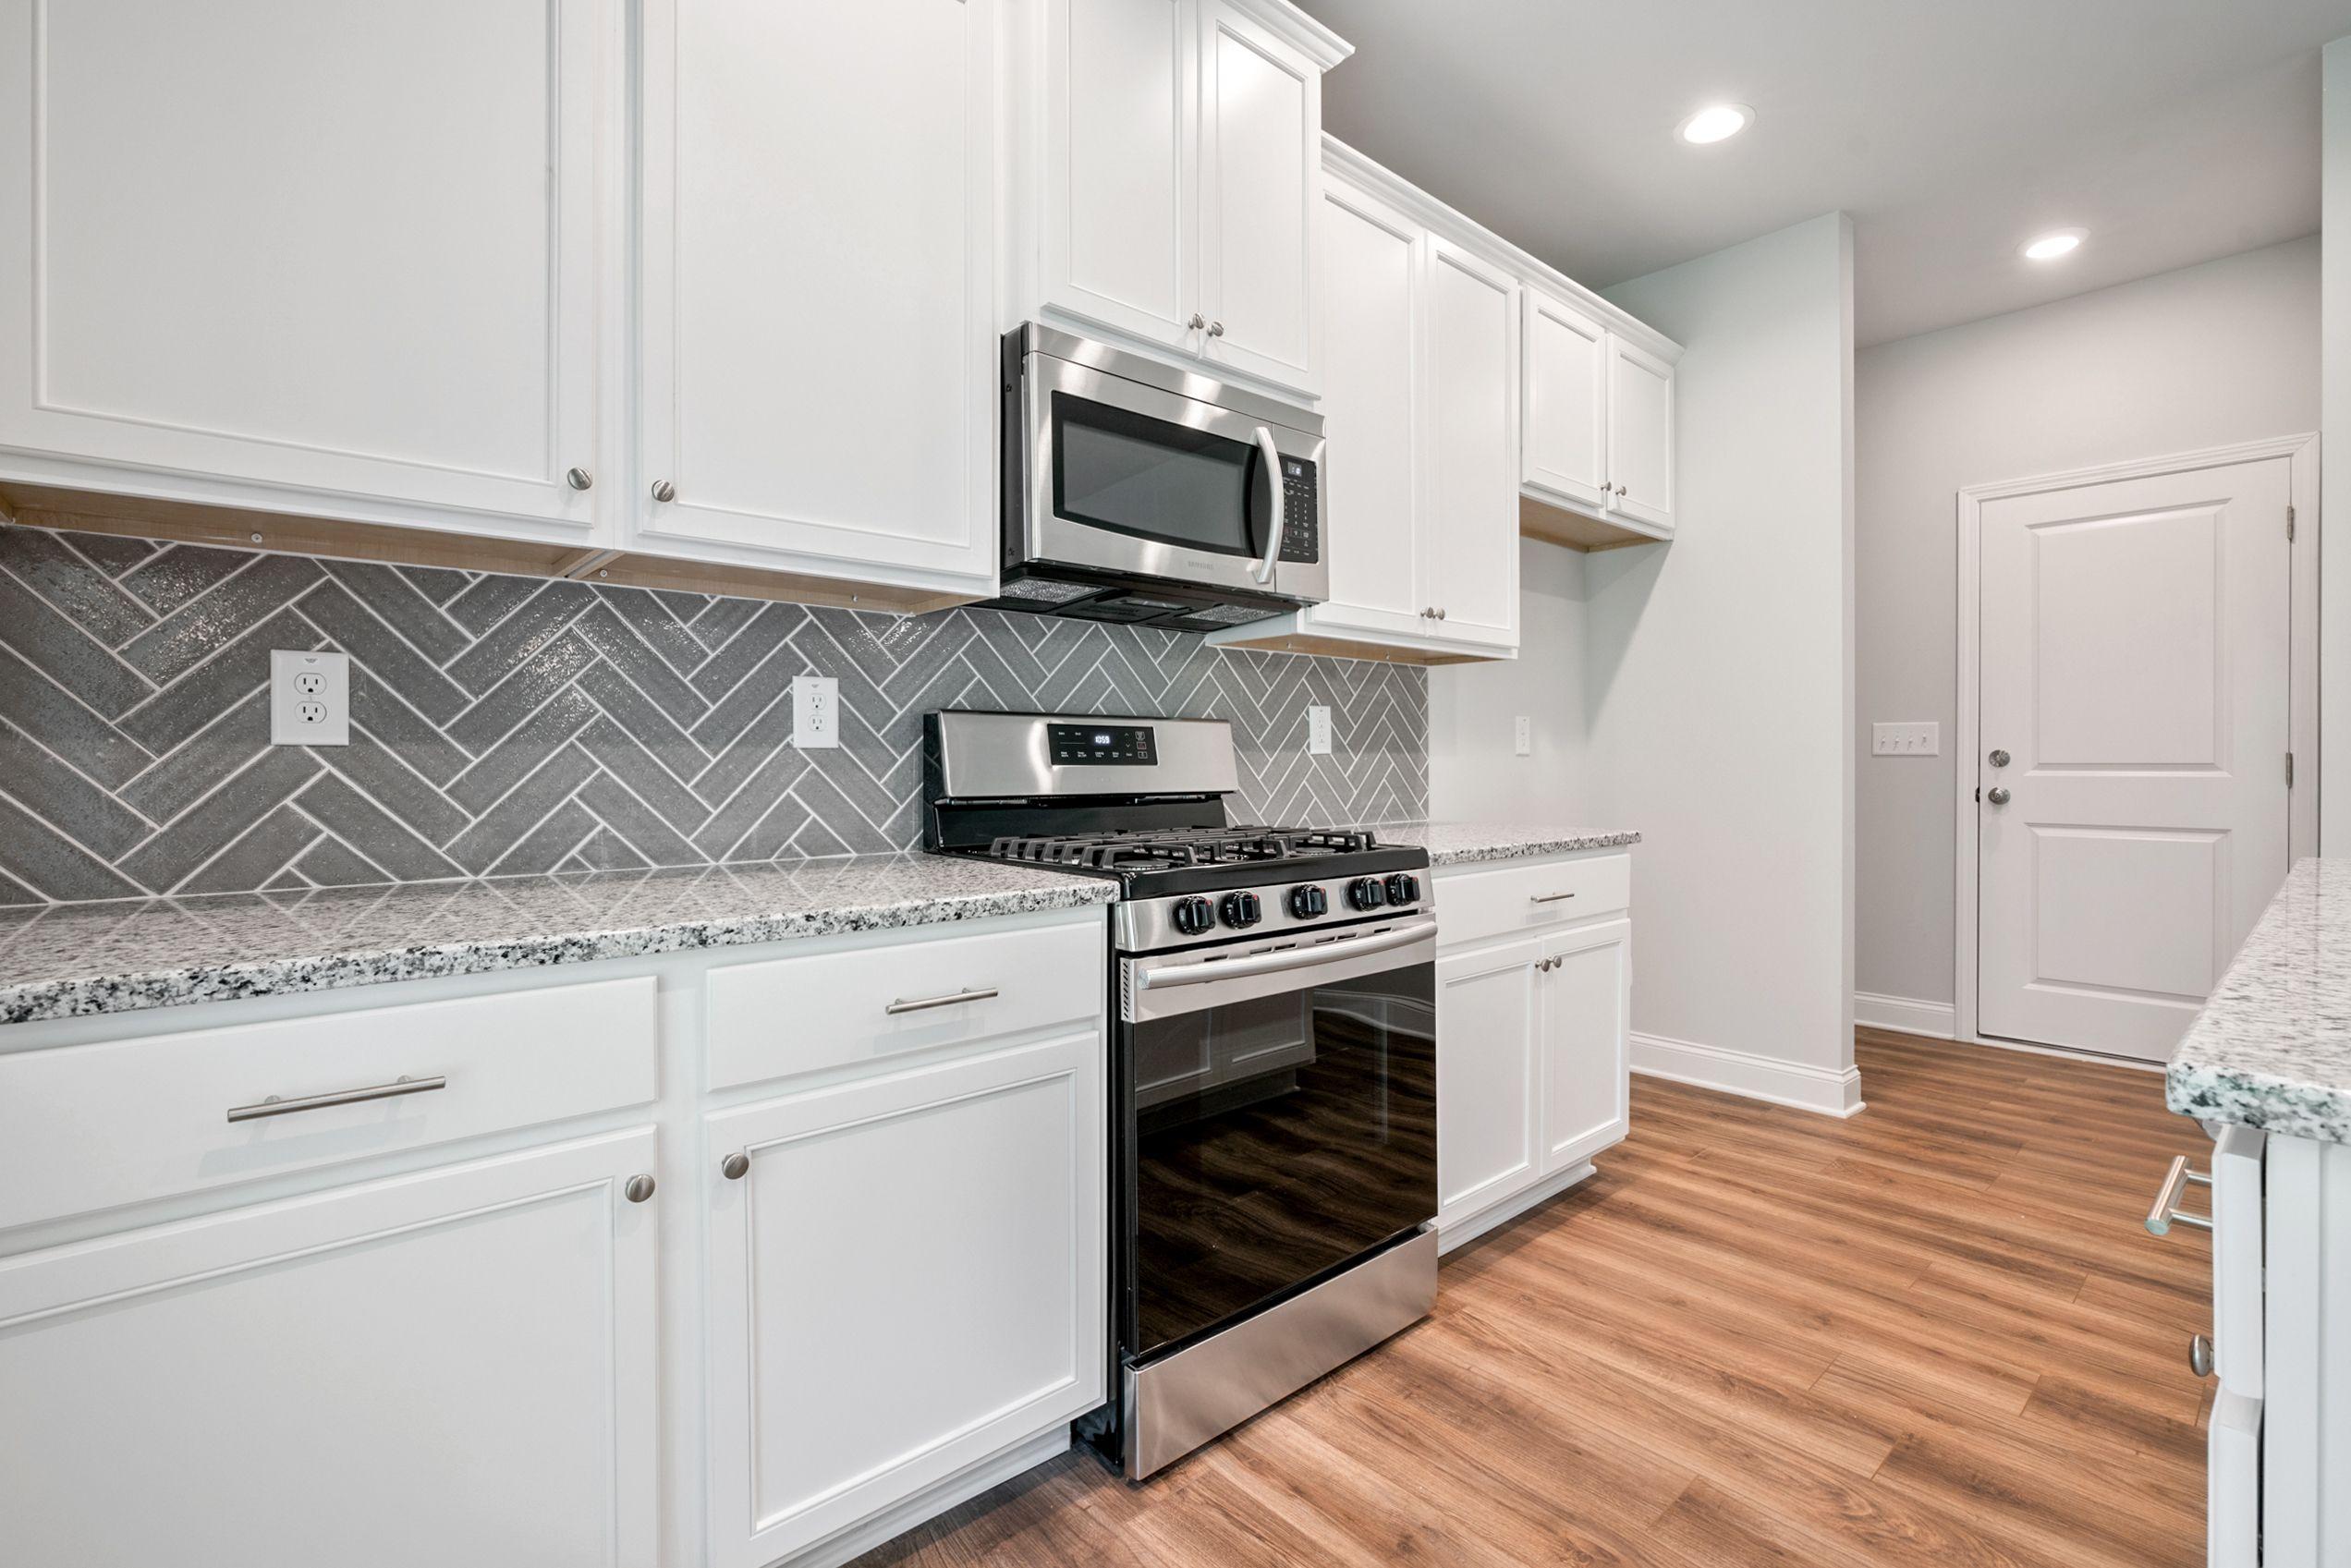 Kitchen featured in the Alston (Farmhouse Series) By Artisan Built Communities in Atlanta, GA